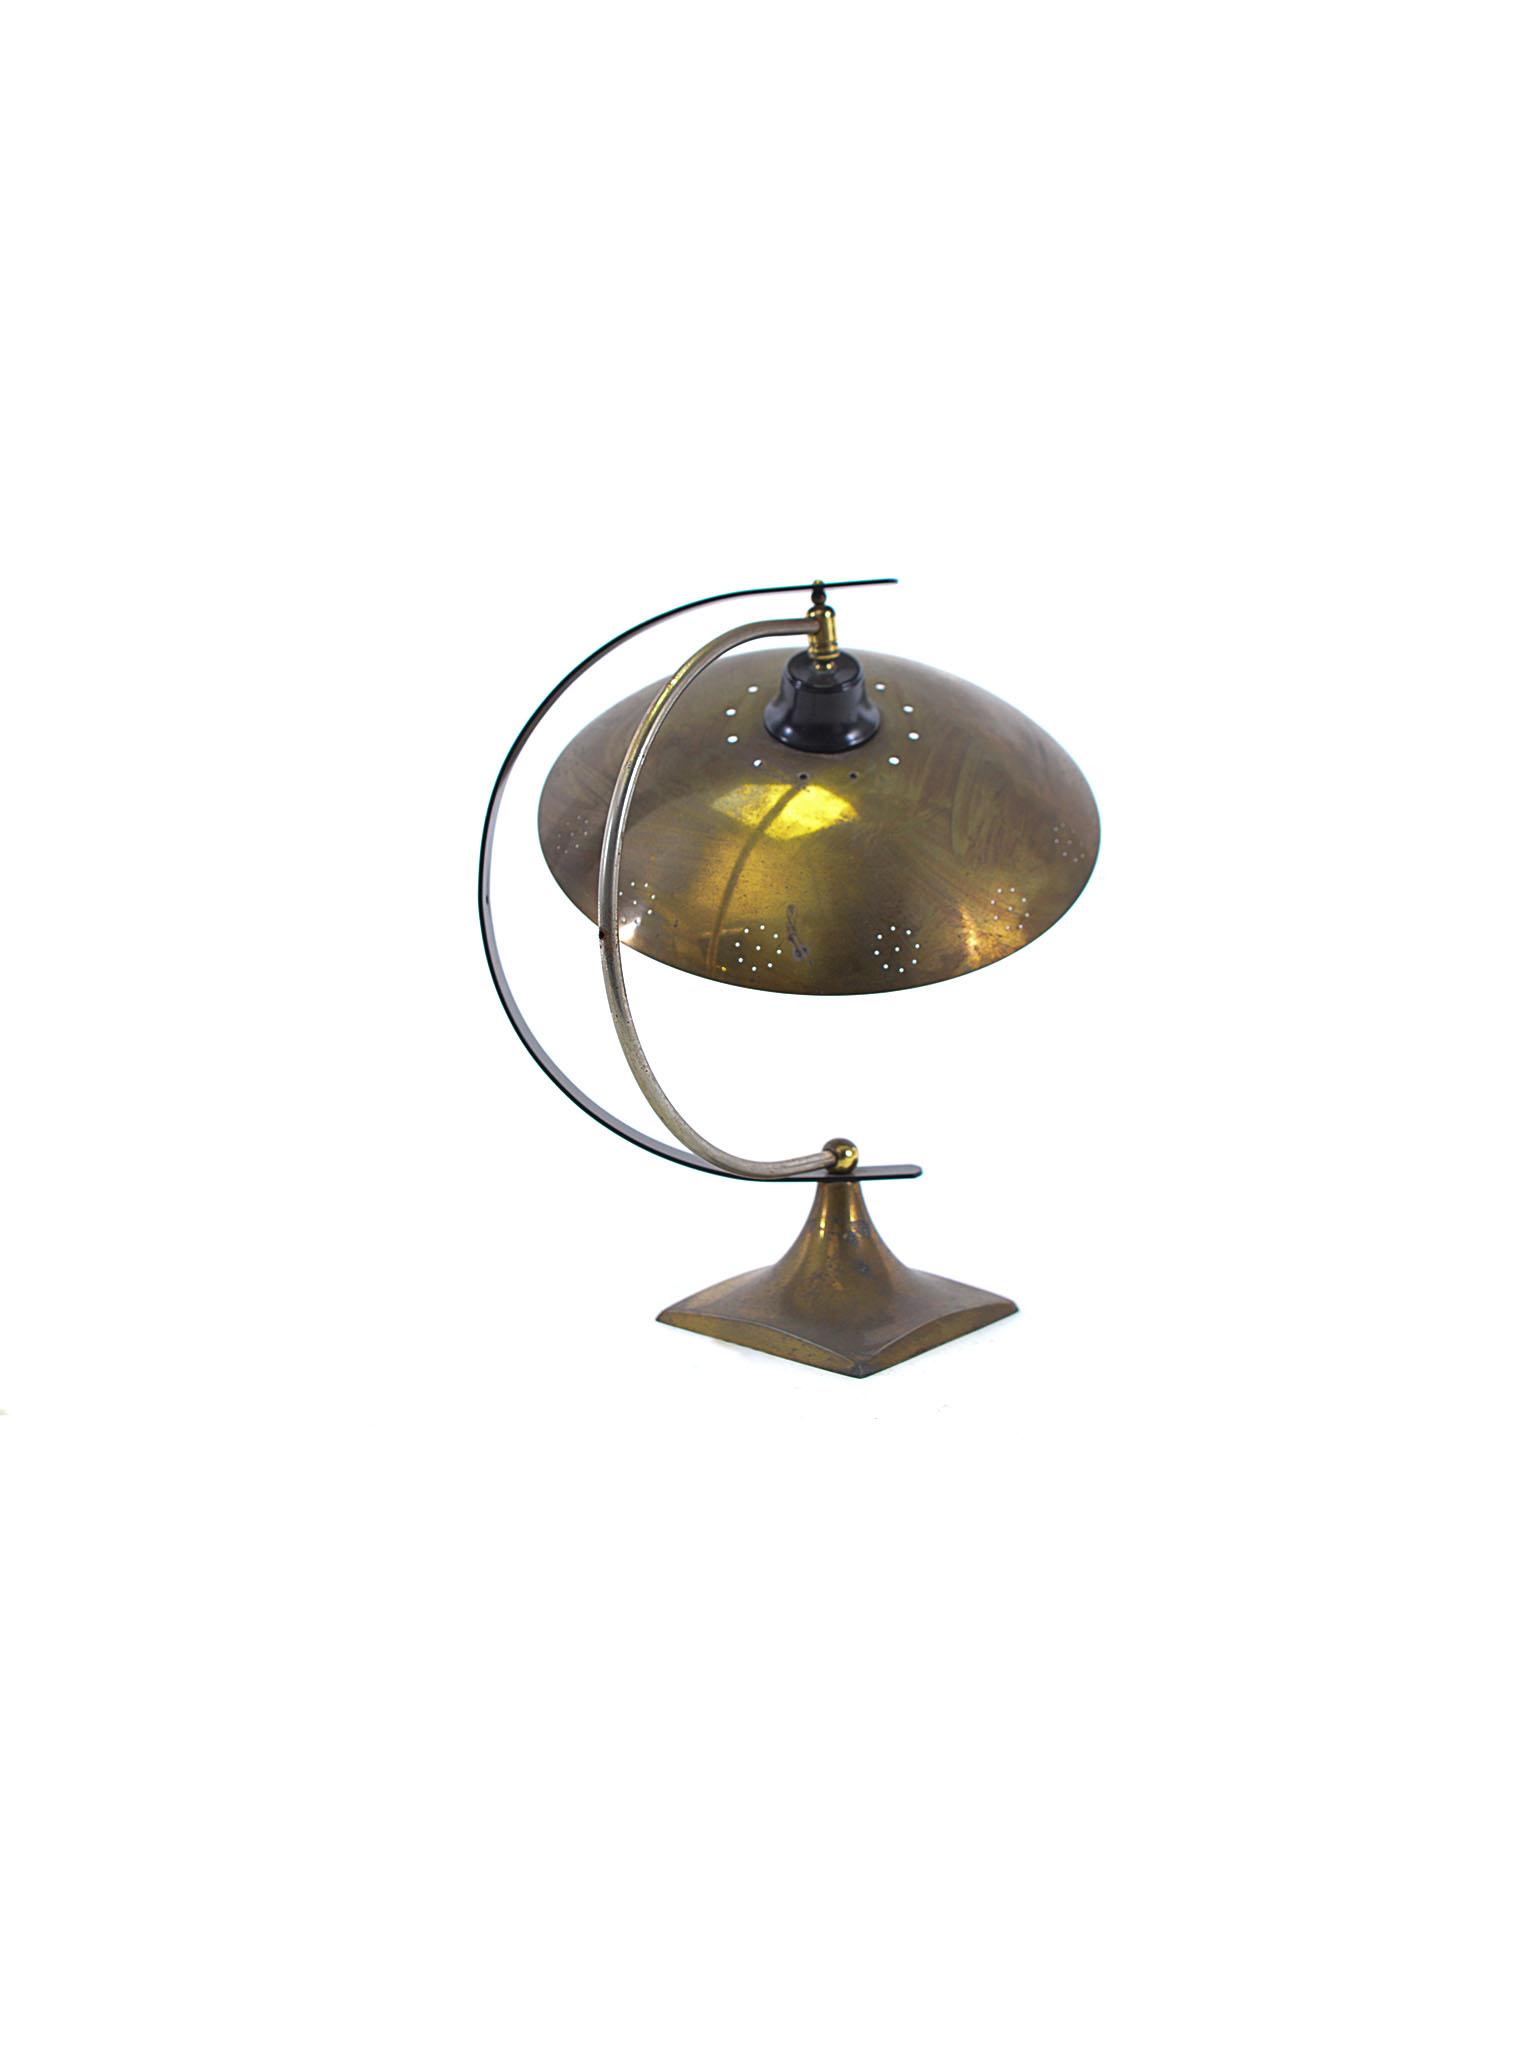 ART DECO HALF MOON DESK LAMP